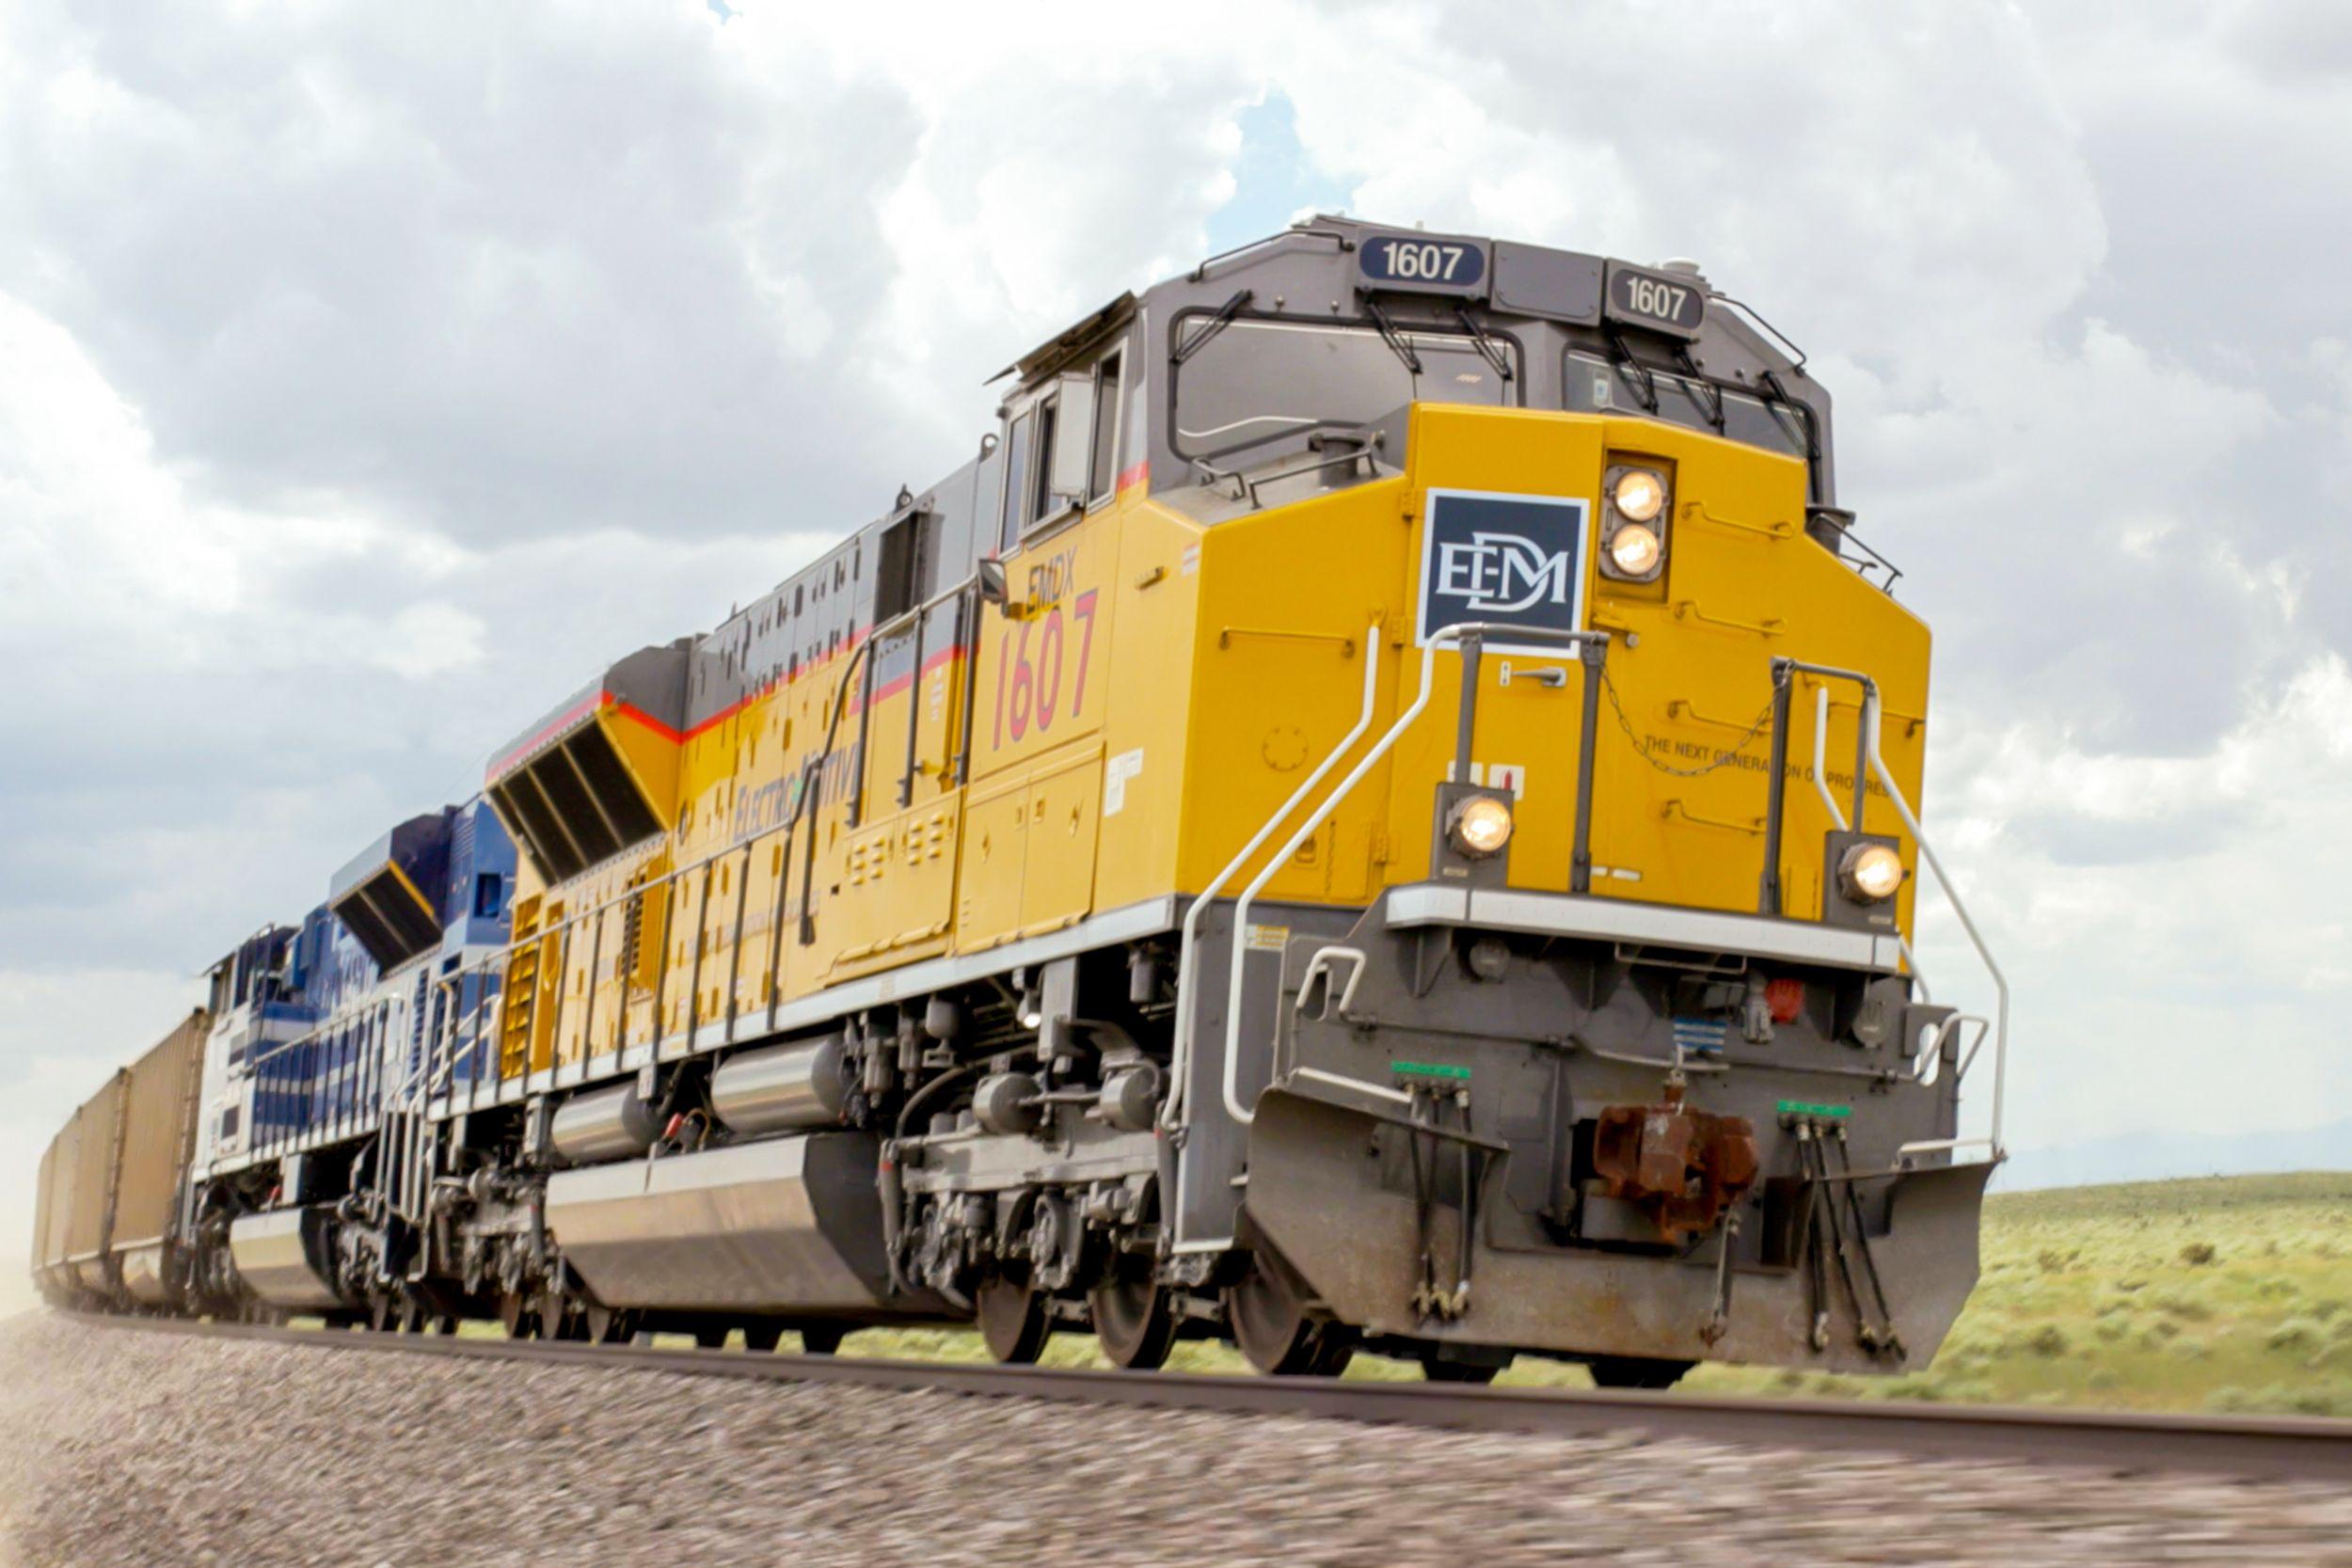 EMD®Freight Locomotives